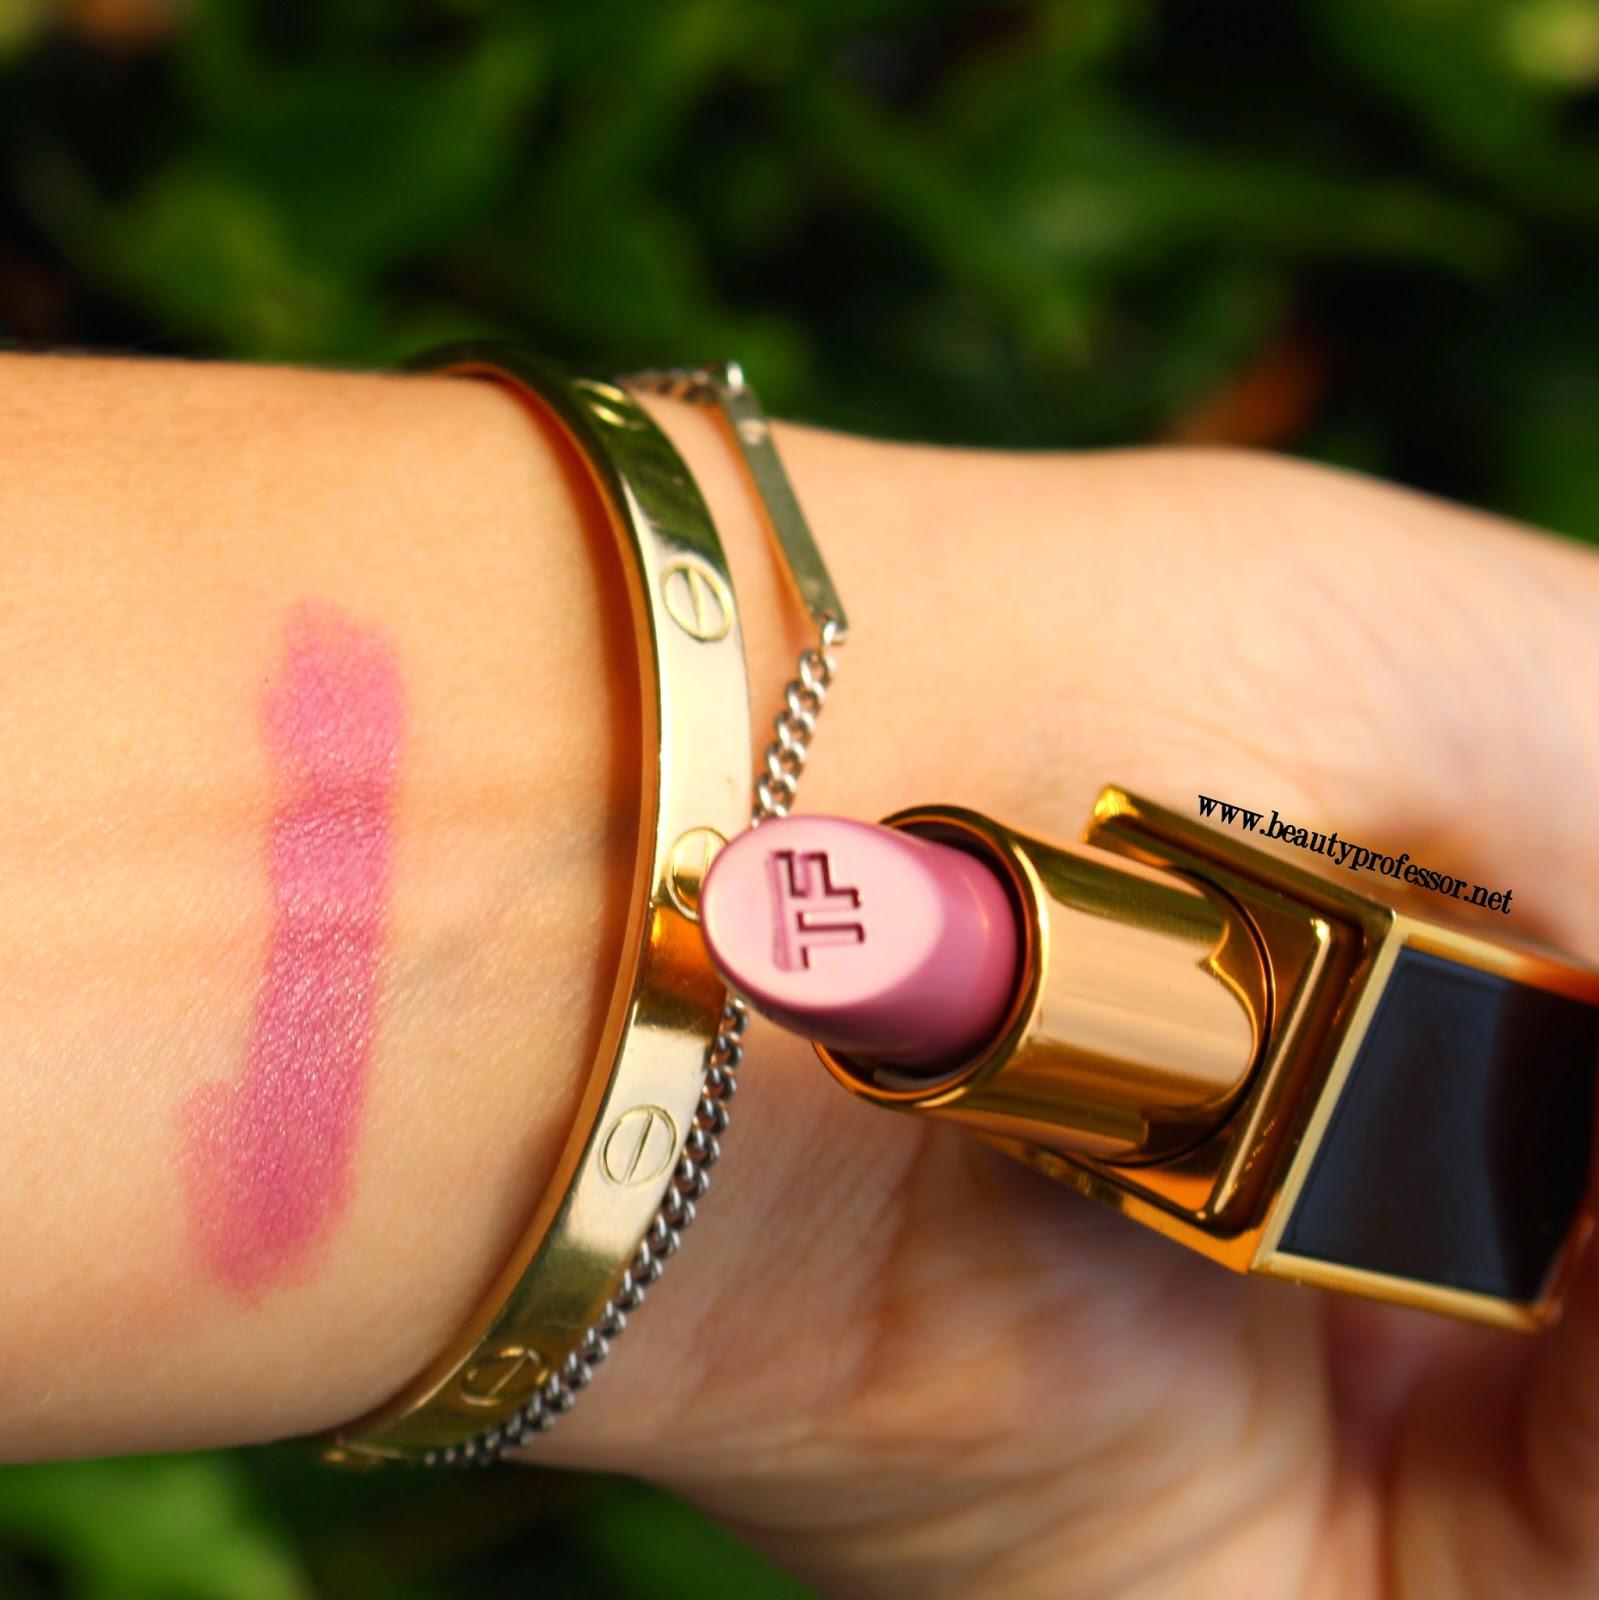 tom ford julian lipstick swatch